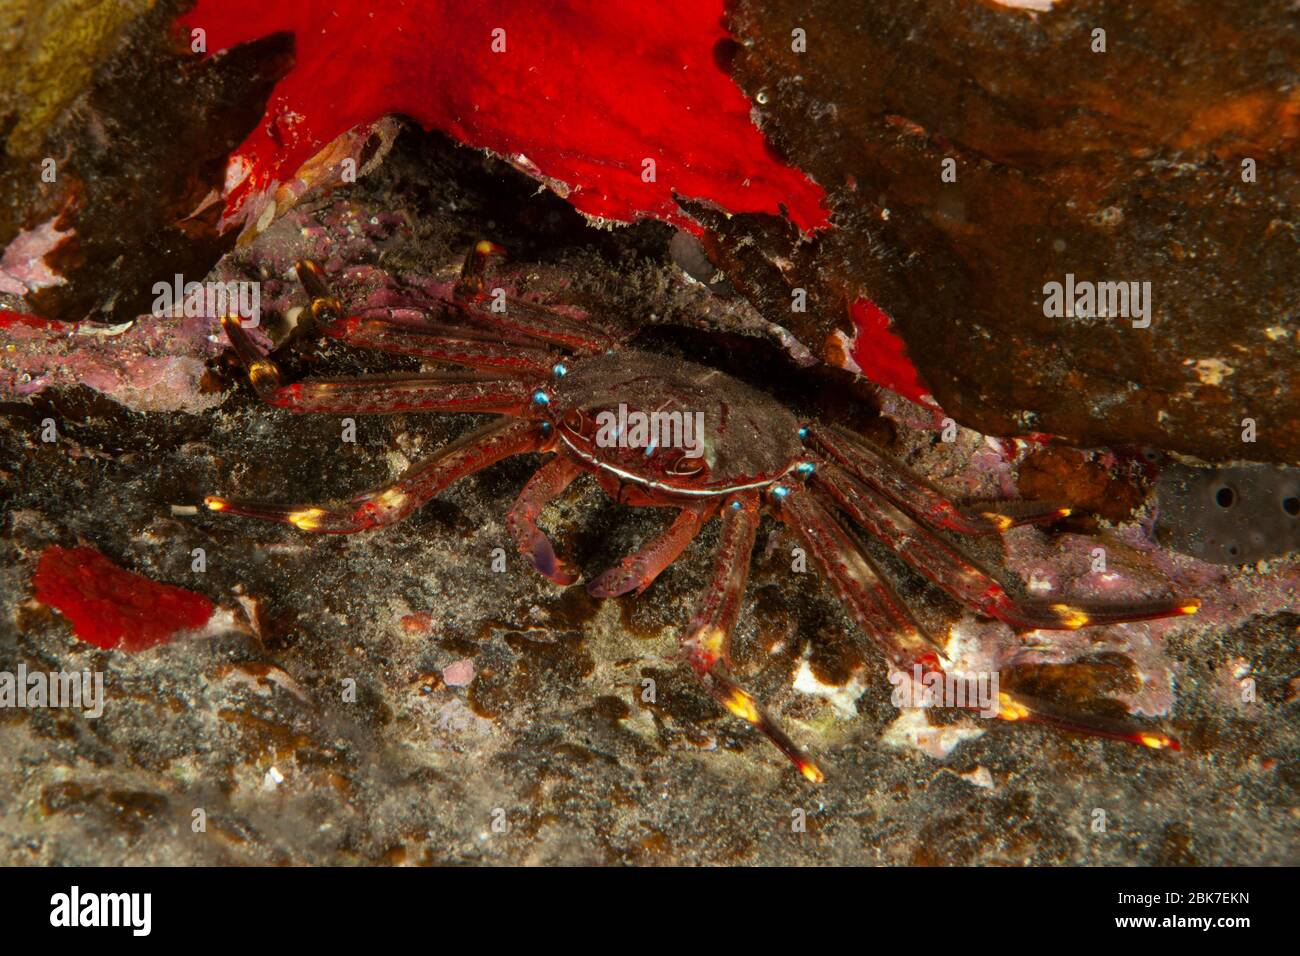 Klippenkrabbe (Grapsus adscensionis), Ostatlantik, Kanarische Inseln, Spanien Stock Photo